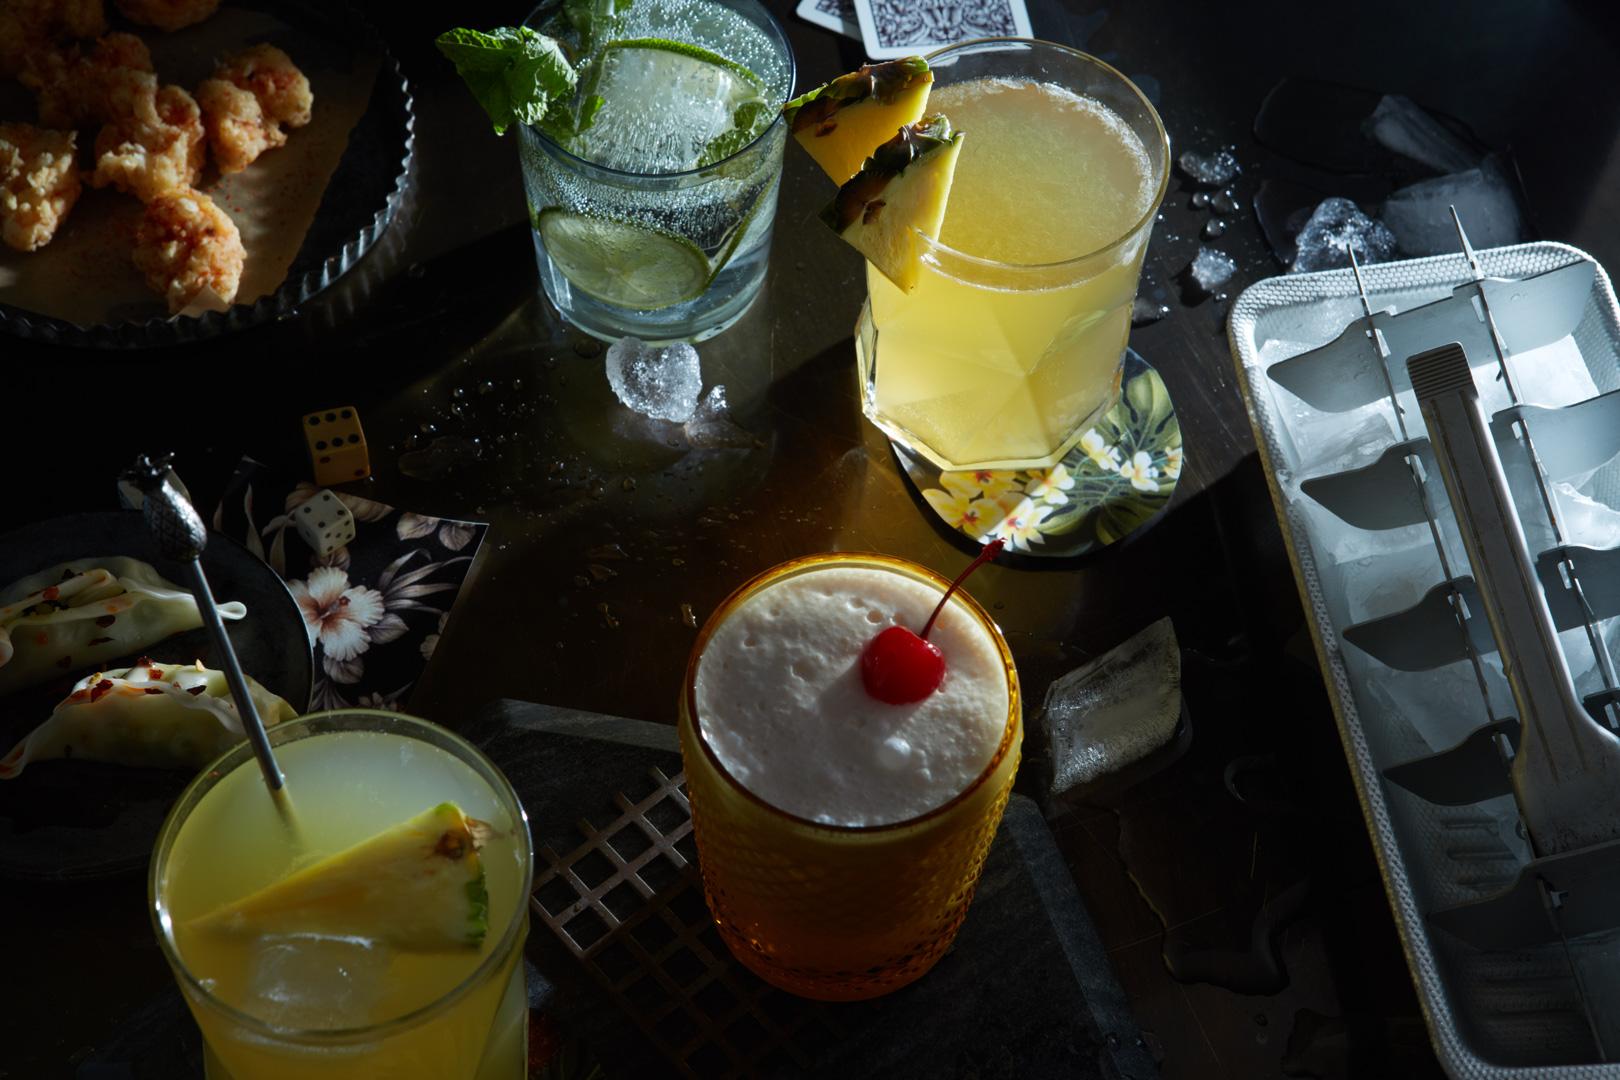 160128_Jerrie_Joy_Cocktails_508-1080.jpg